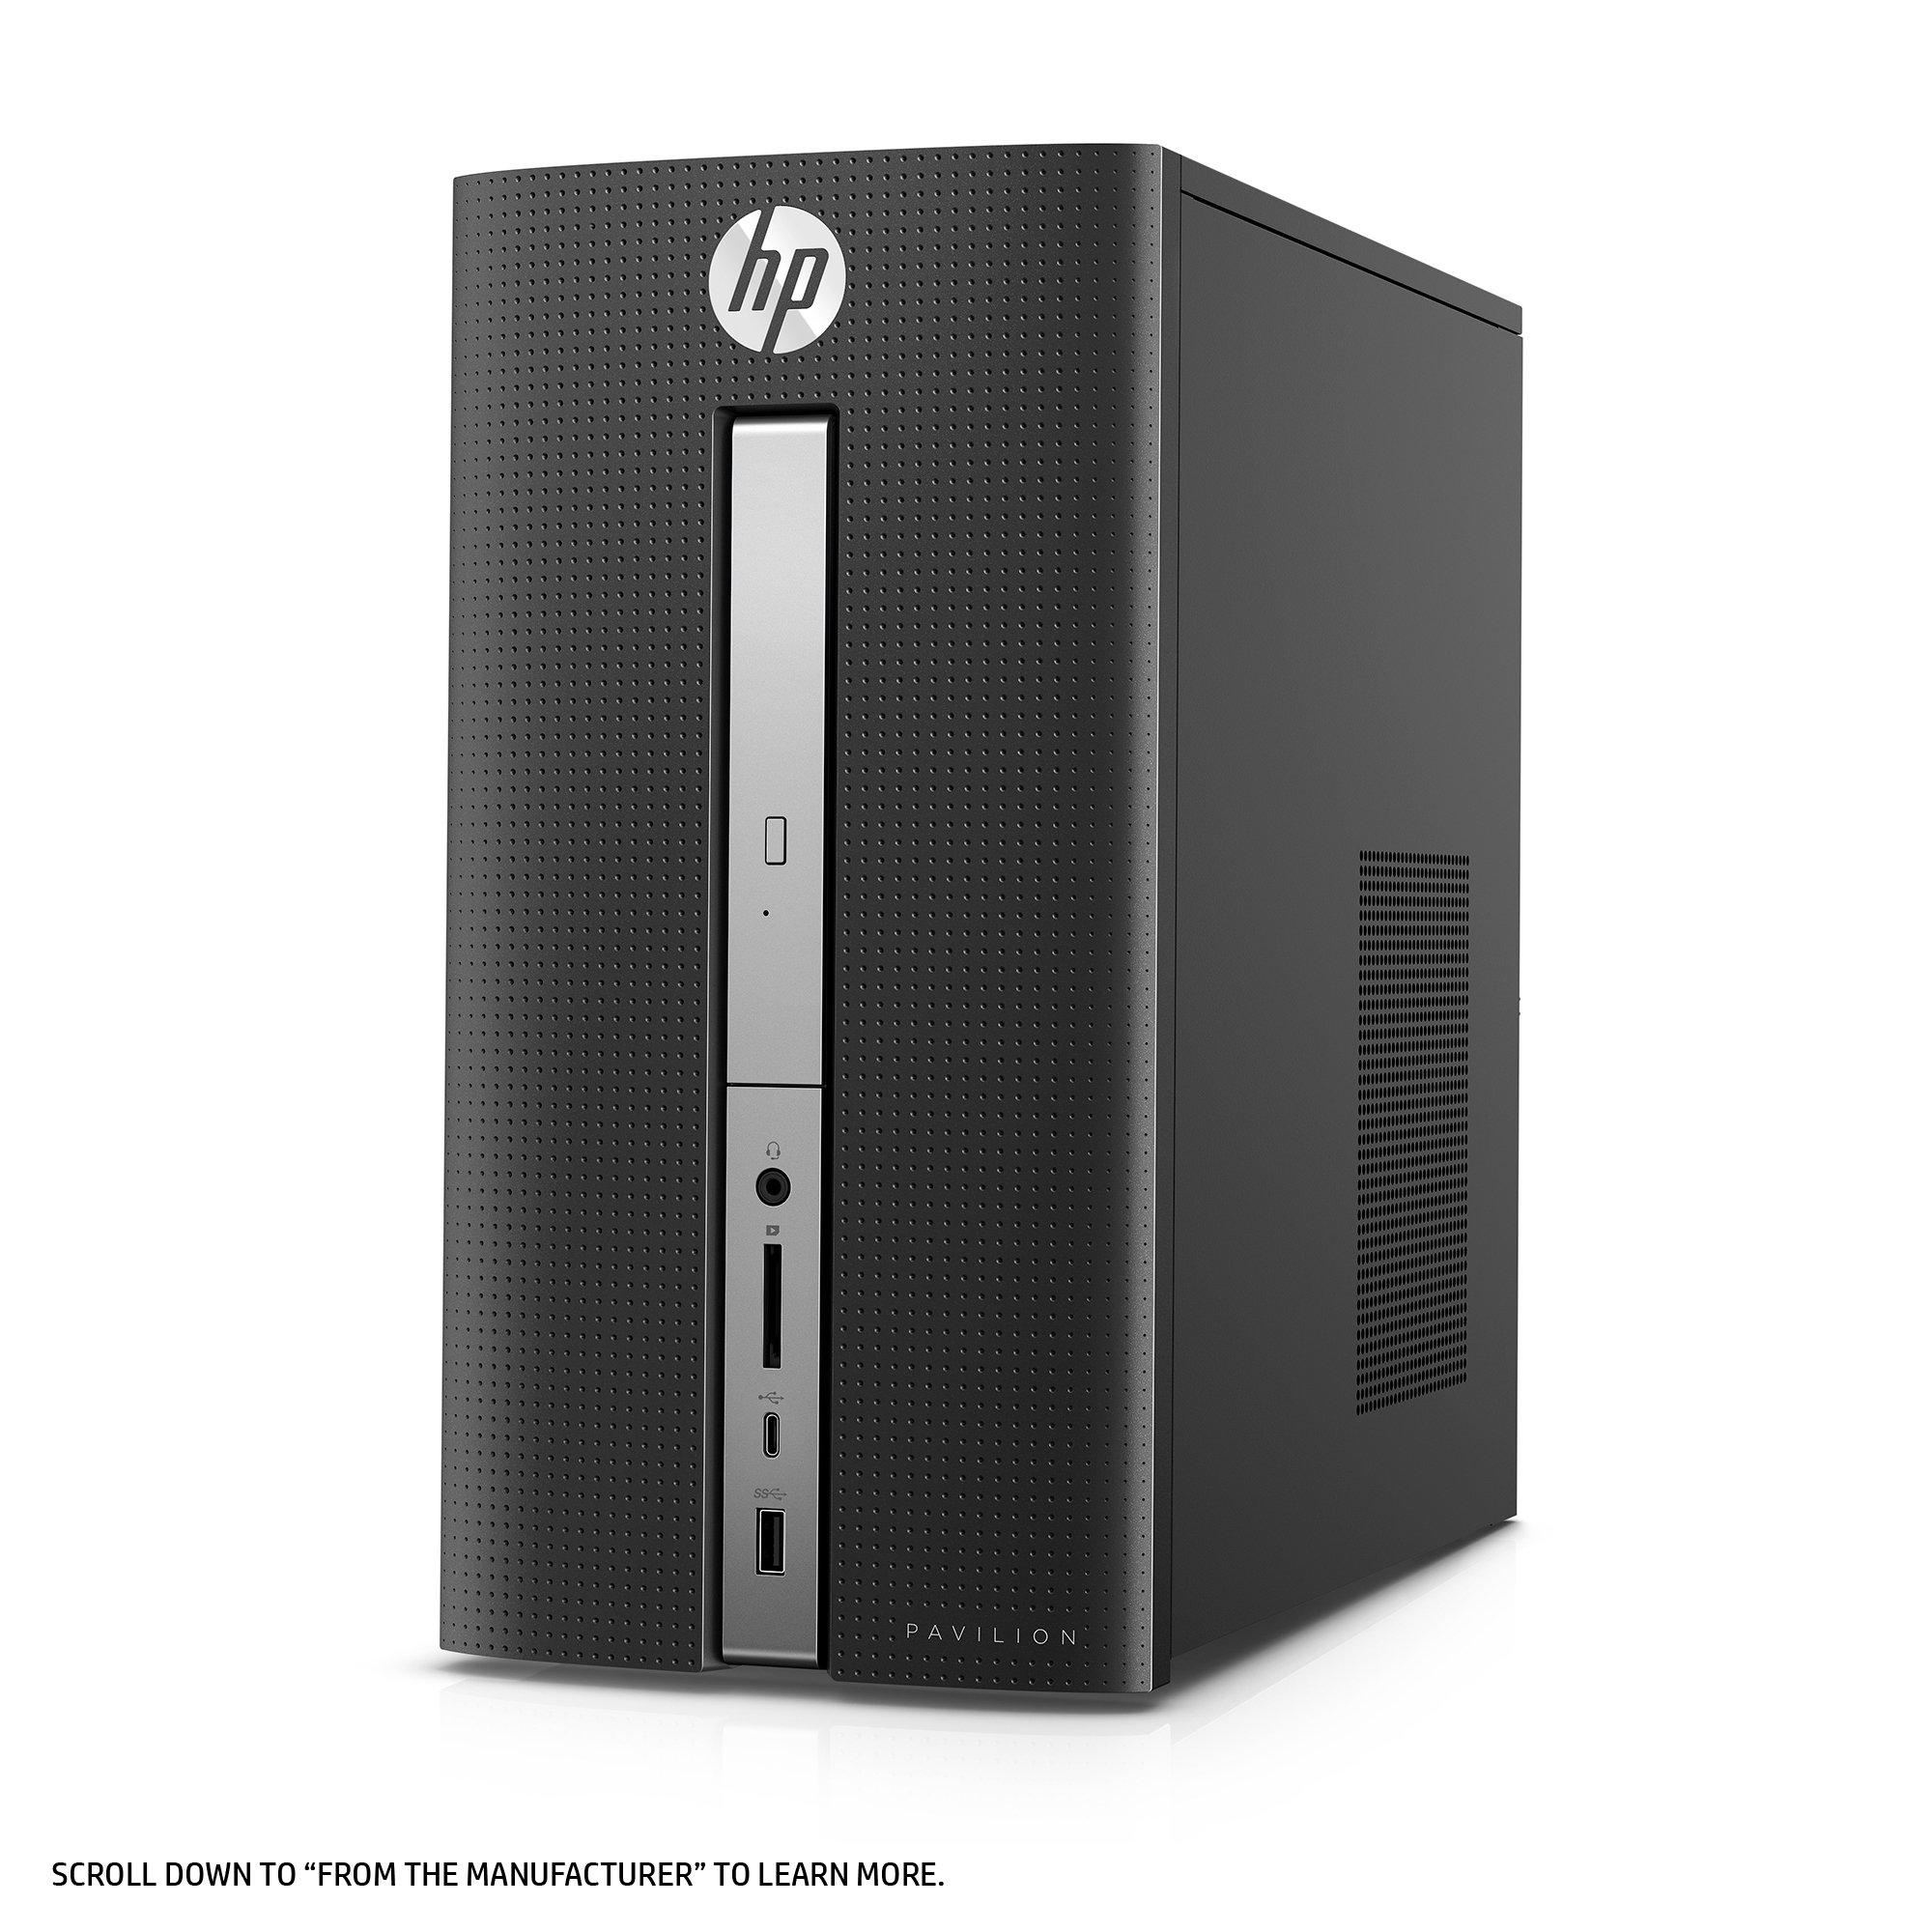 HP Pavilion Desktop Computer, Intel Core i7-7700, 12GB RAM, 1TB hard drive, Windows 10 (570-p030, Black) by HP (Image #3)